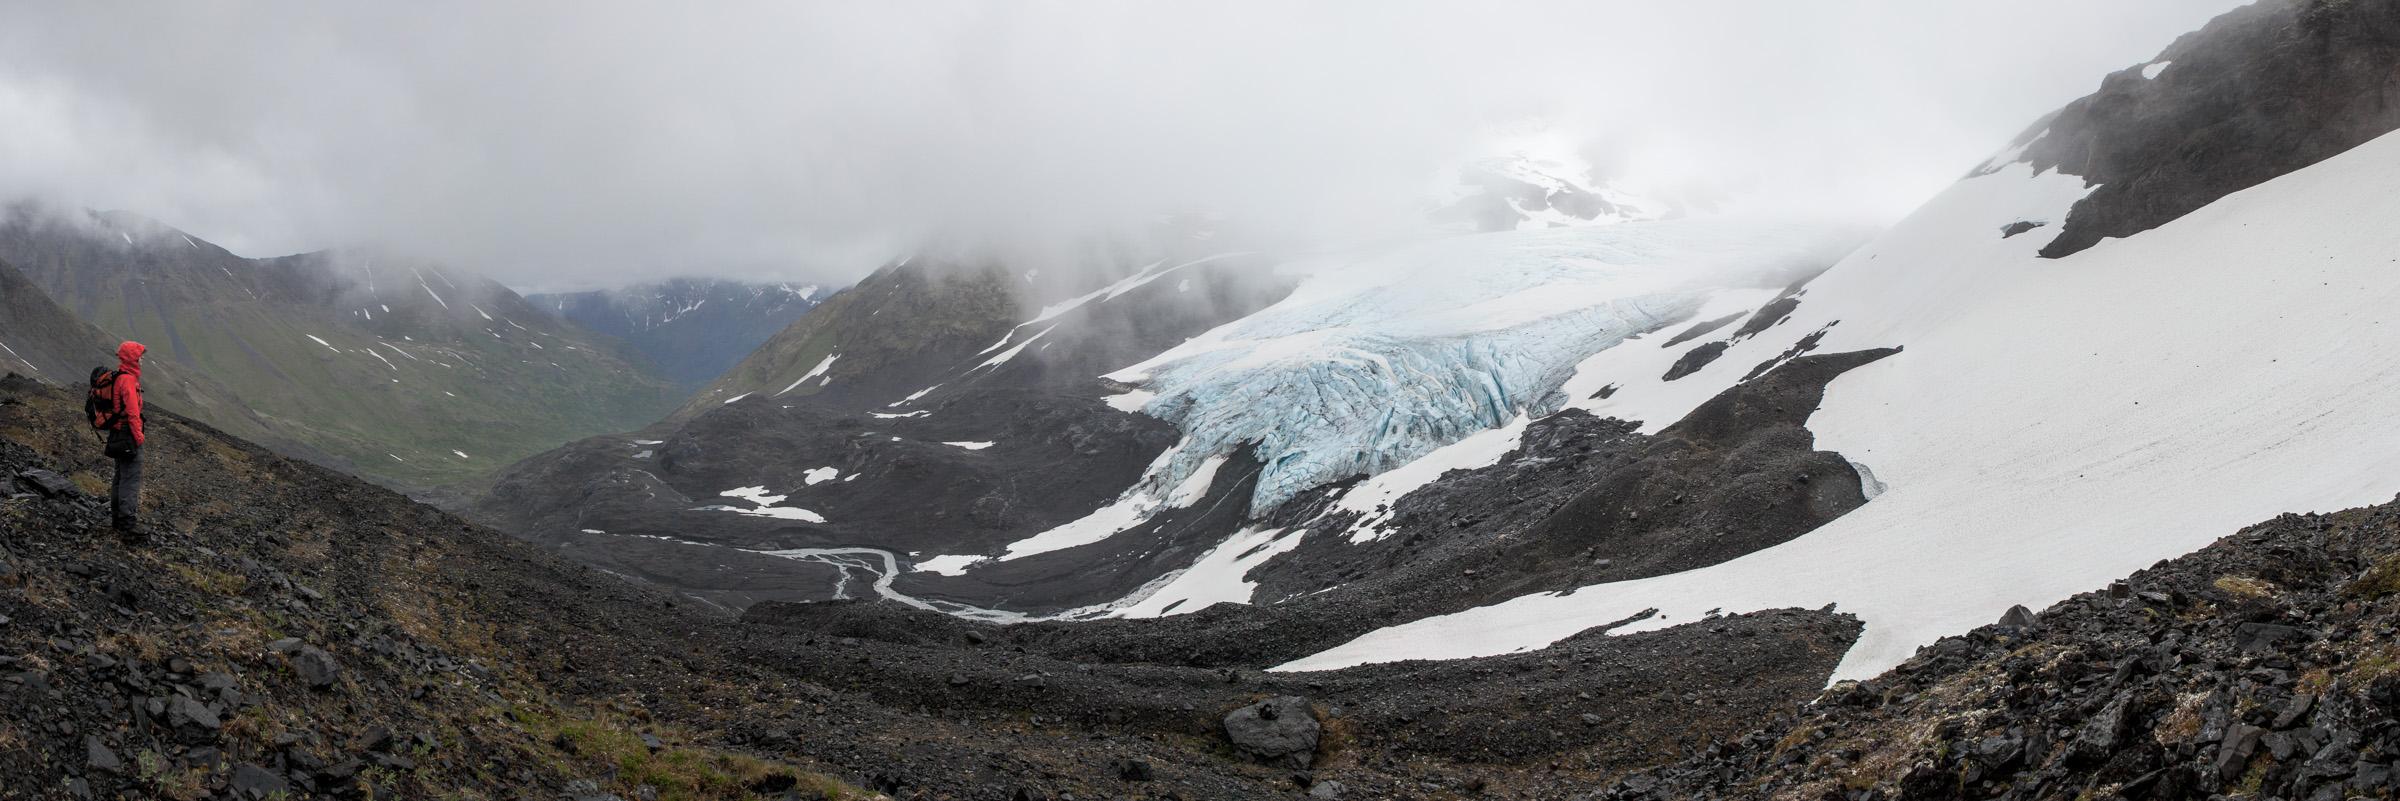 Raven glacier, Crow Pass trail, Alaska